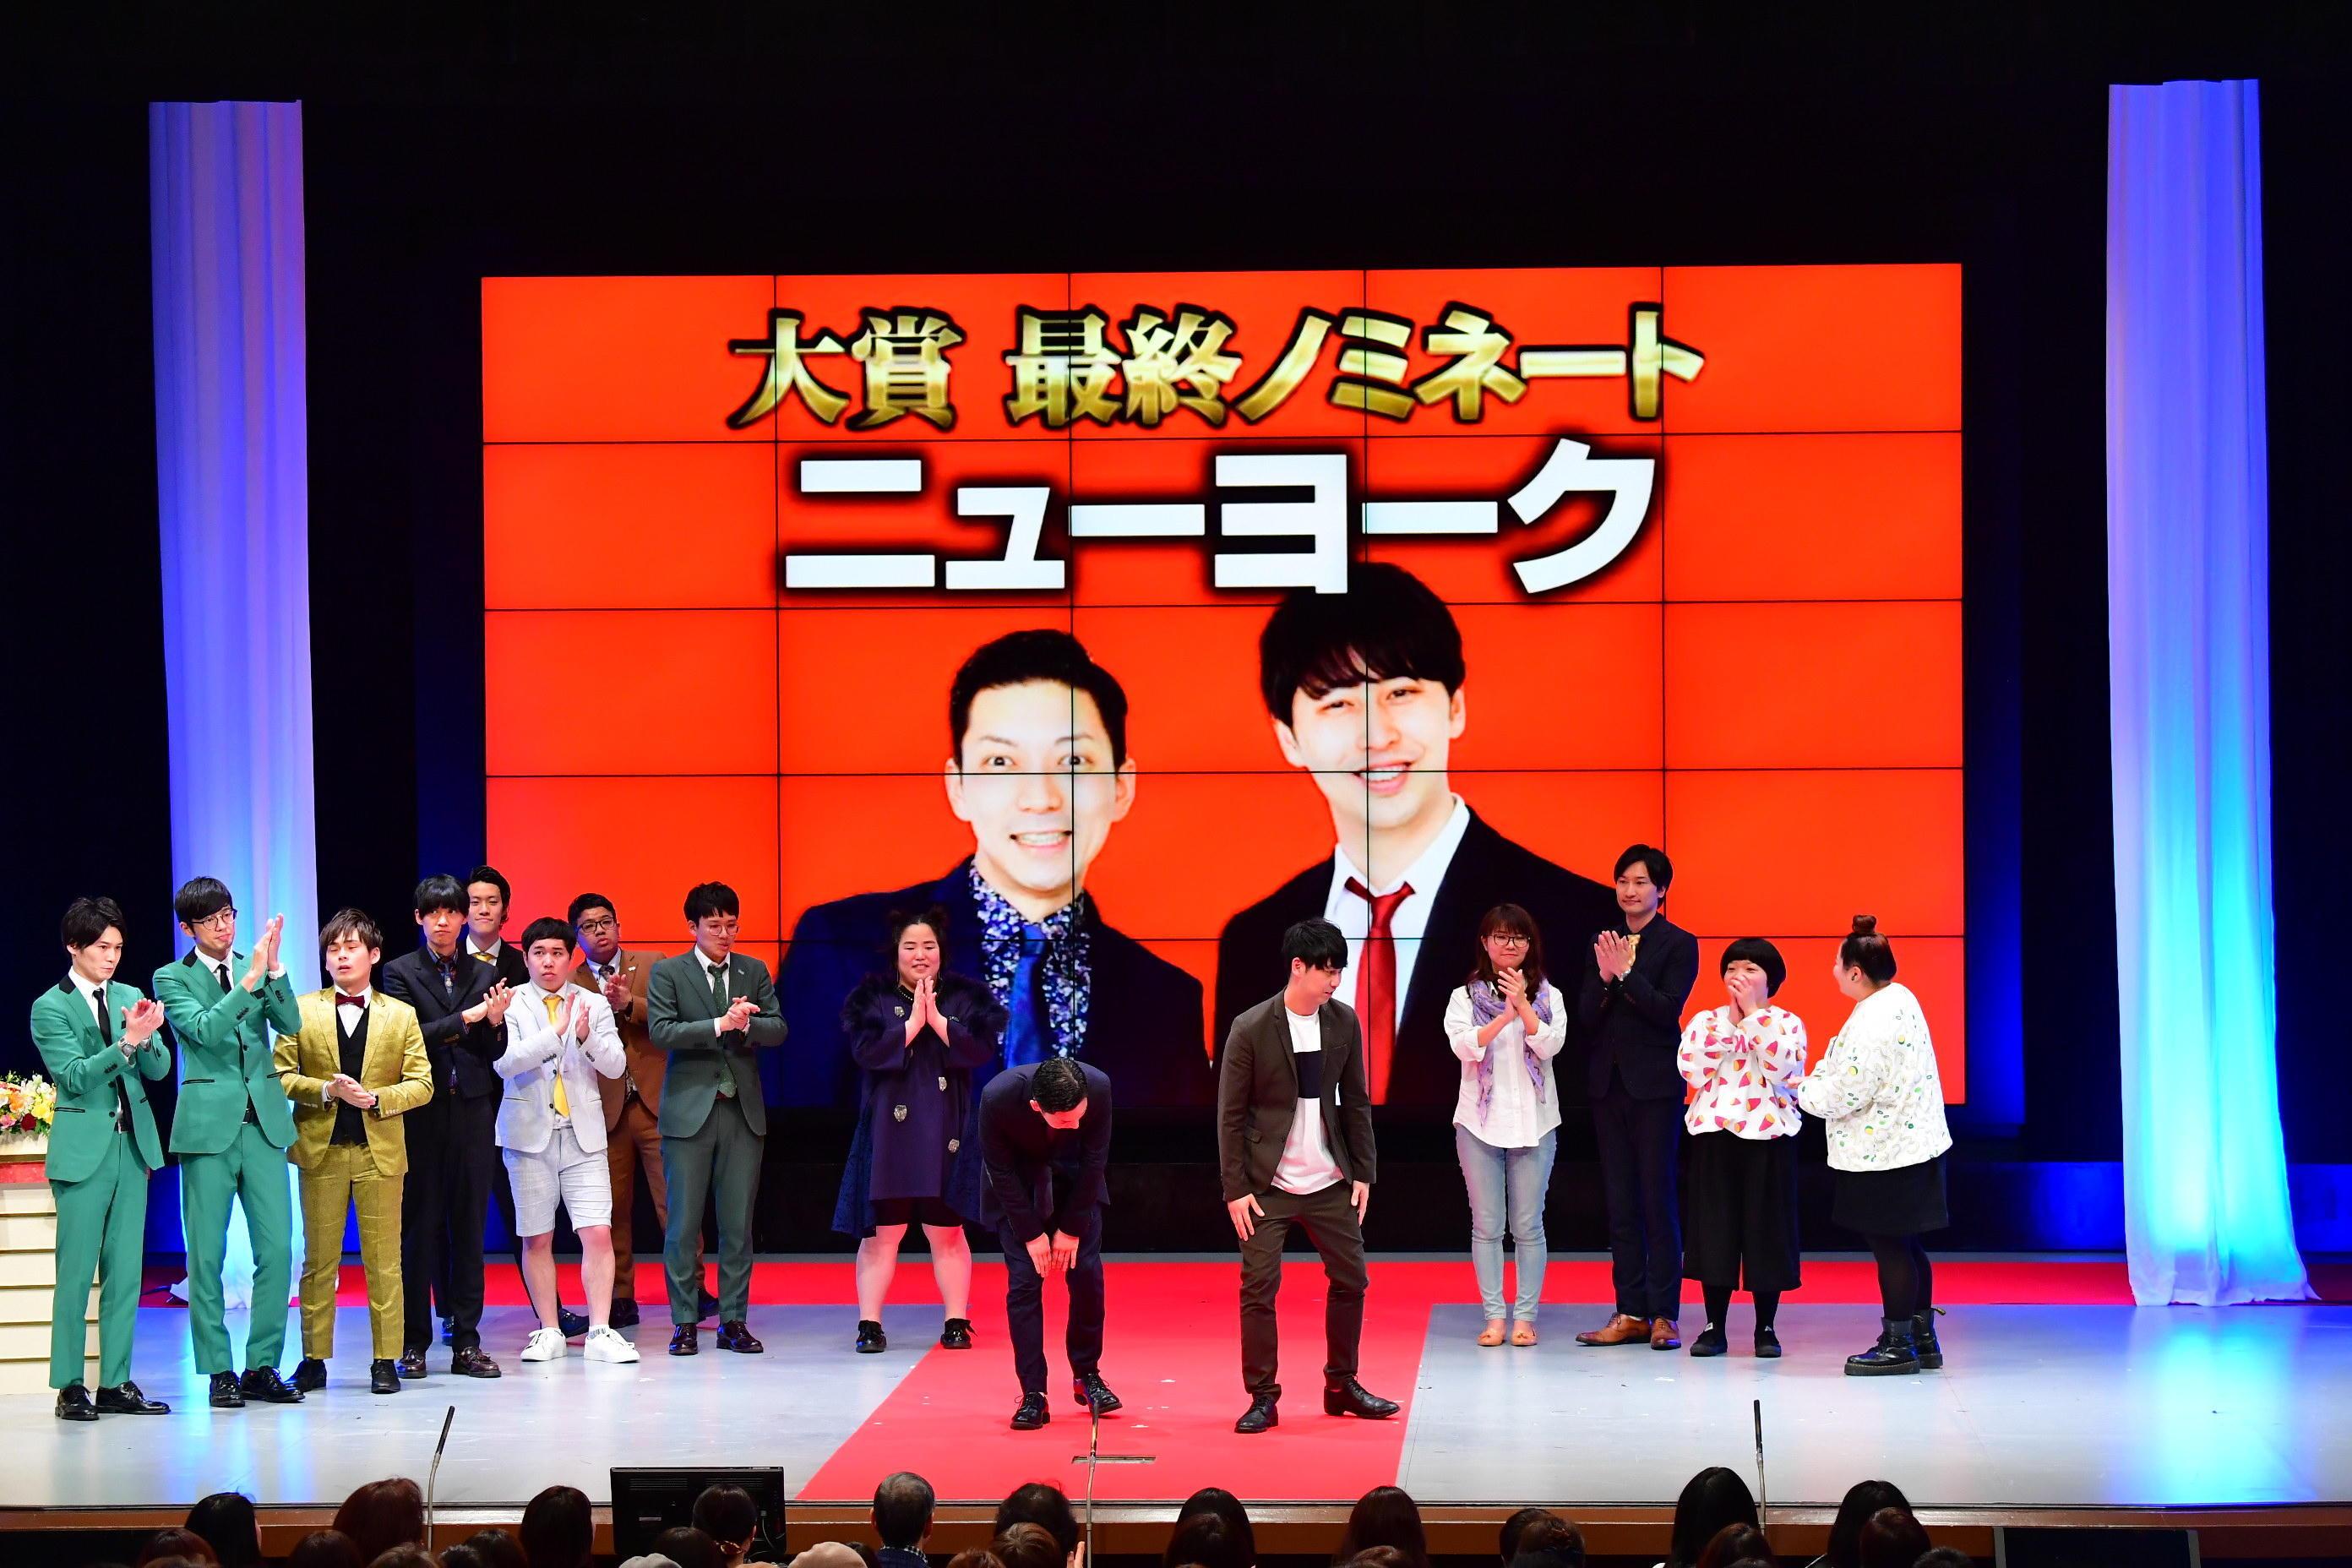 http://news.yoshimoto.co.jp/20180109020357-1f892bb560554e058456e881f9f3fdfb9ffe1924.jpg